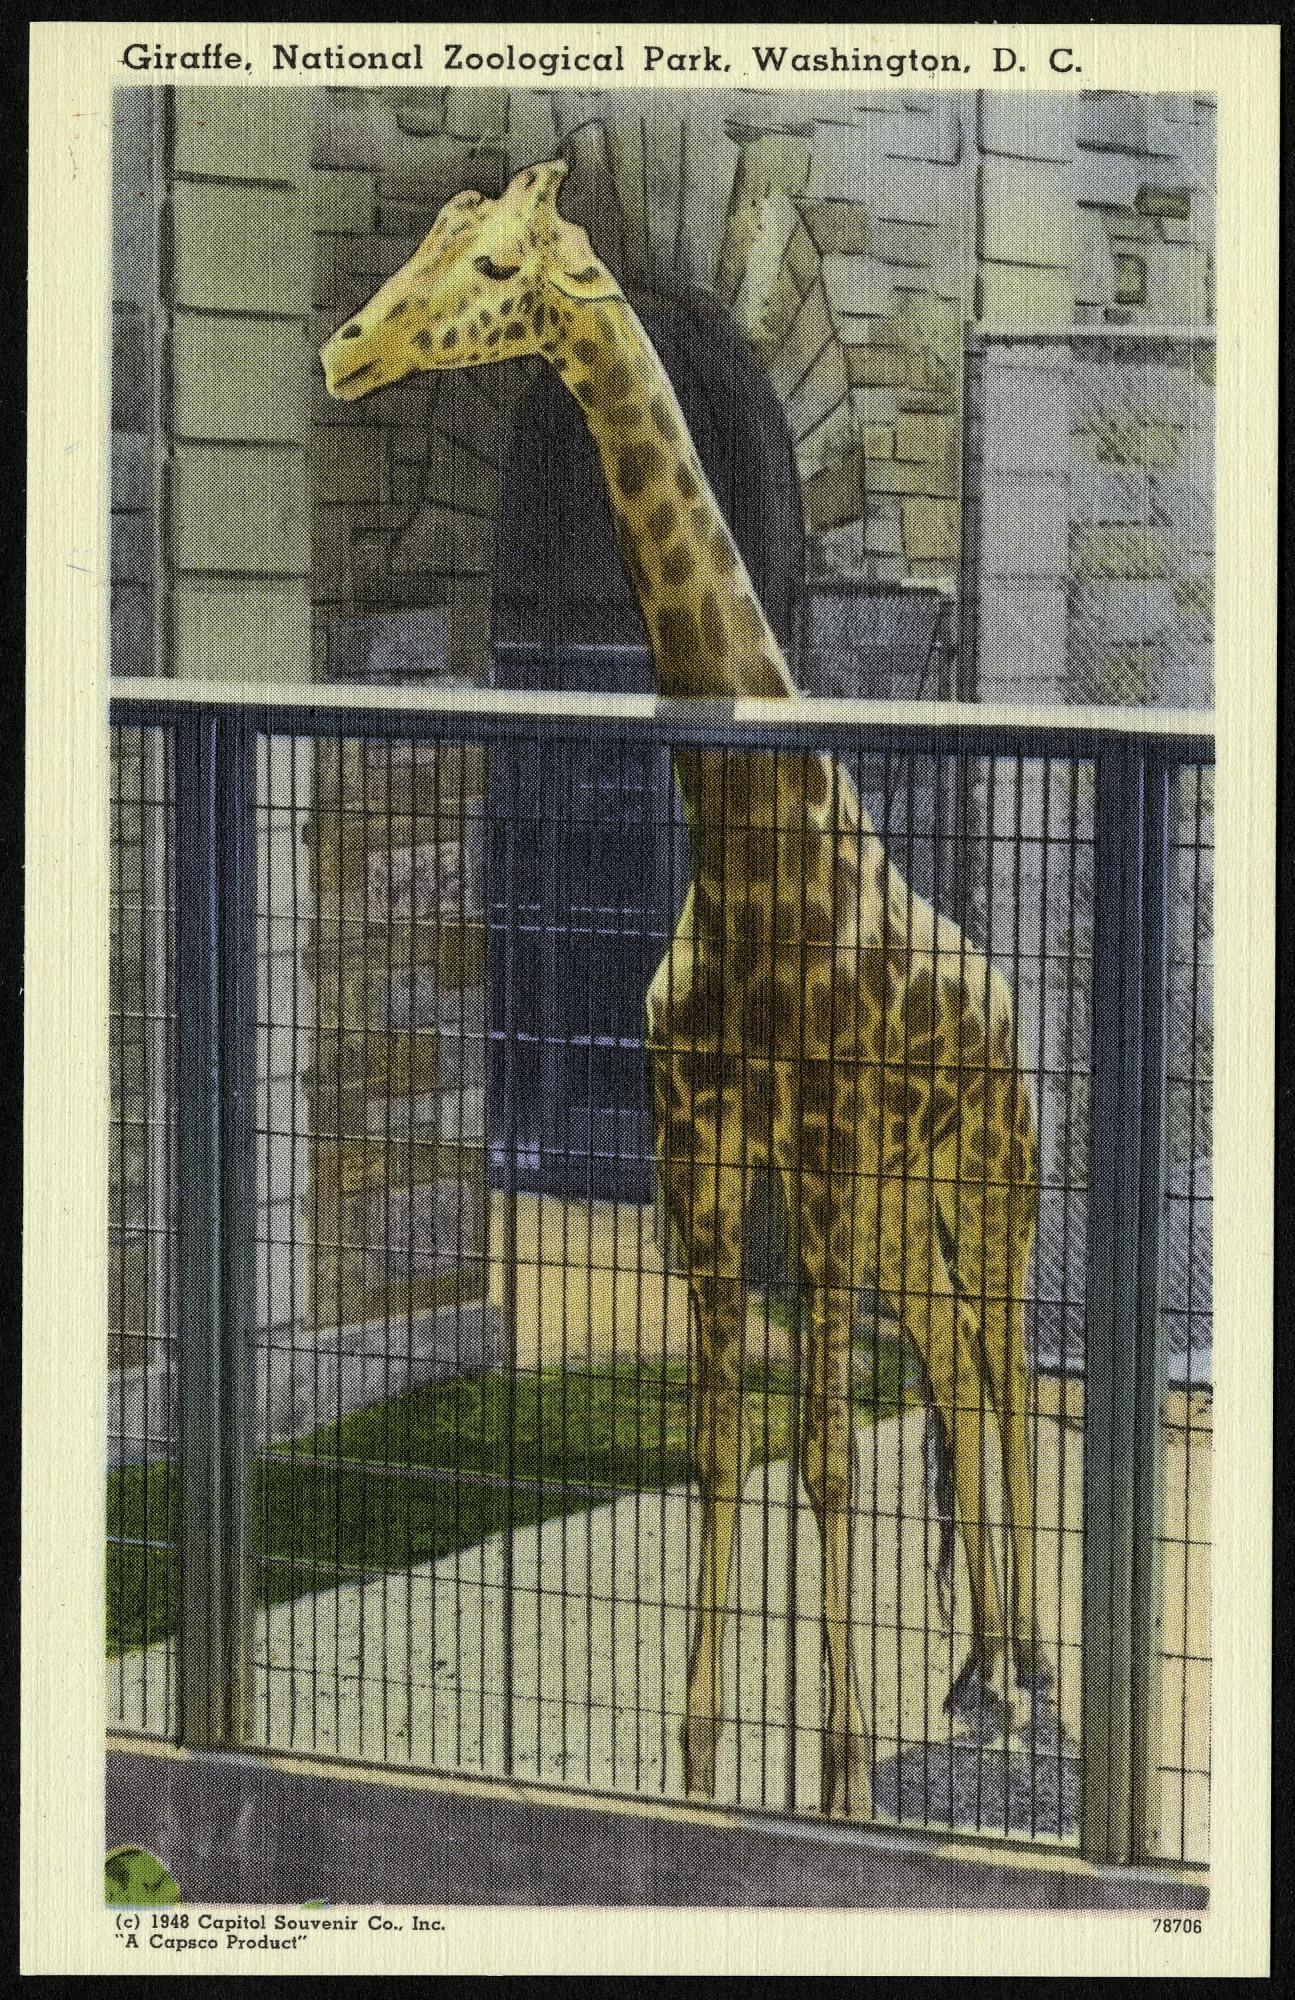 Blank Postcard of a Giraffe at the Zoo